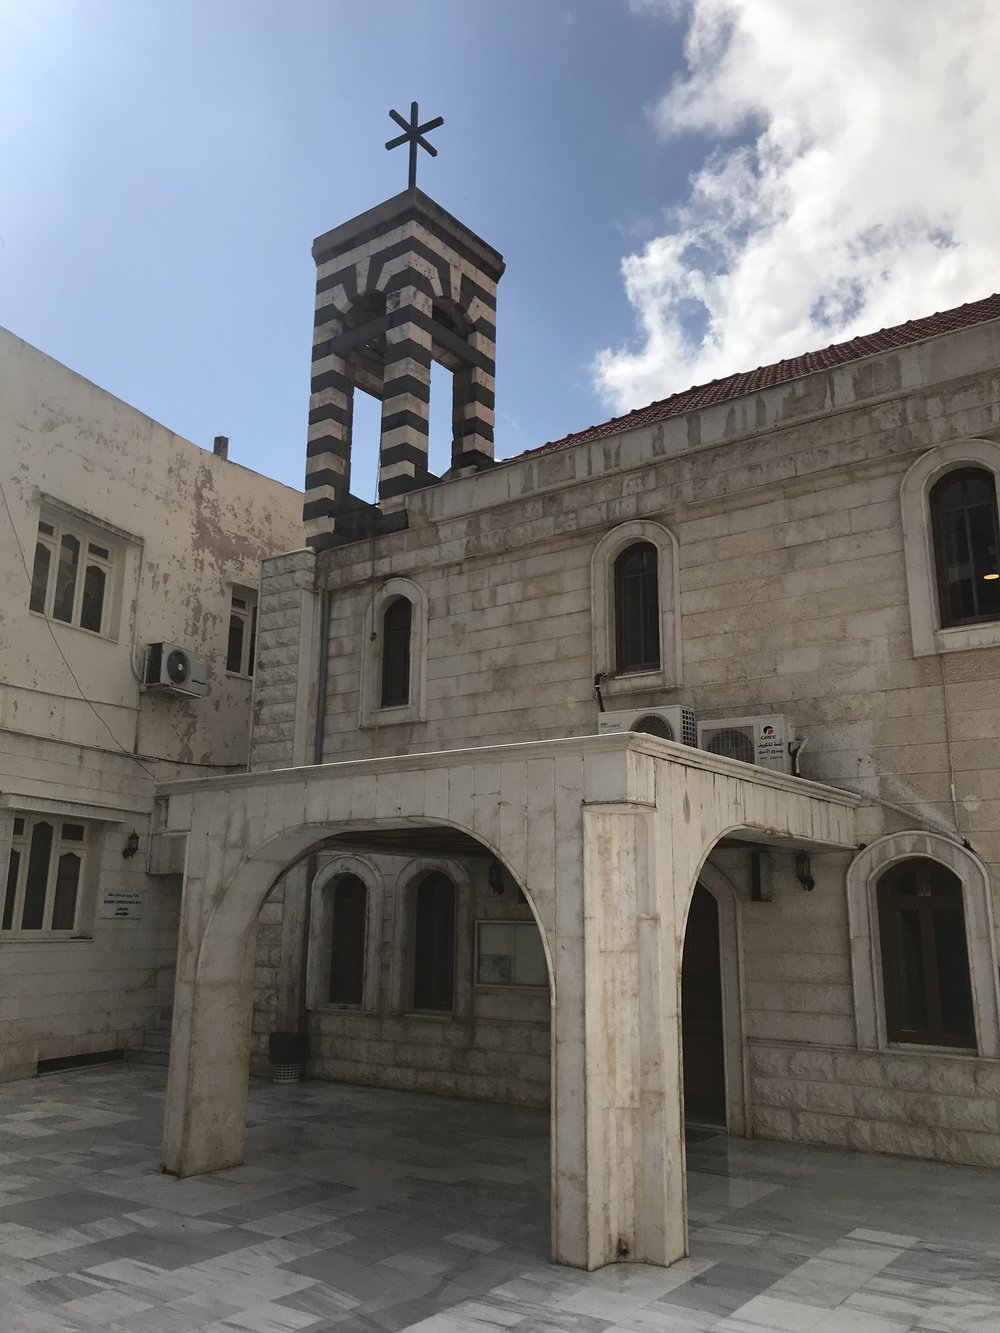 The National Evangelical (Presbyterian) Church of Homs